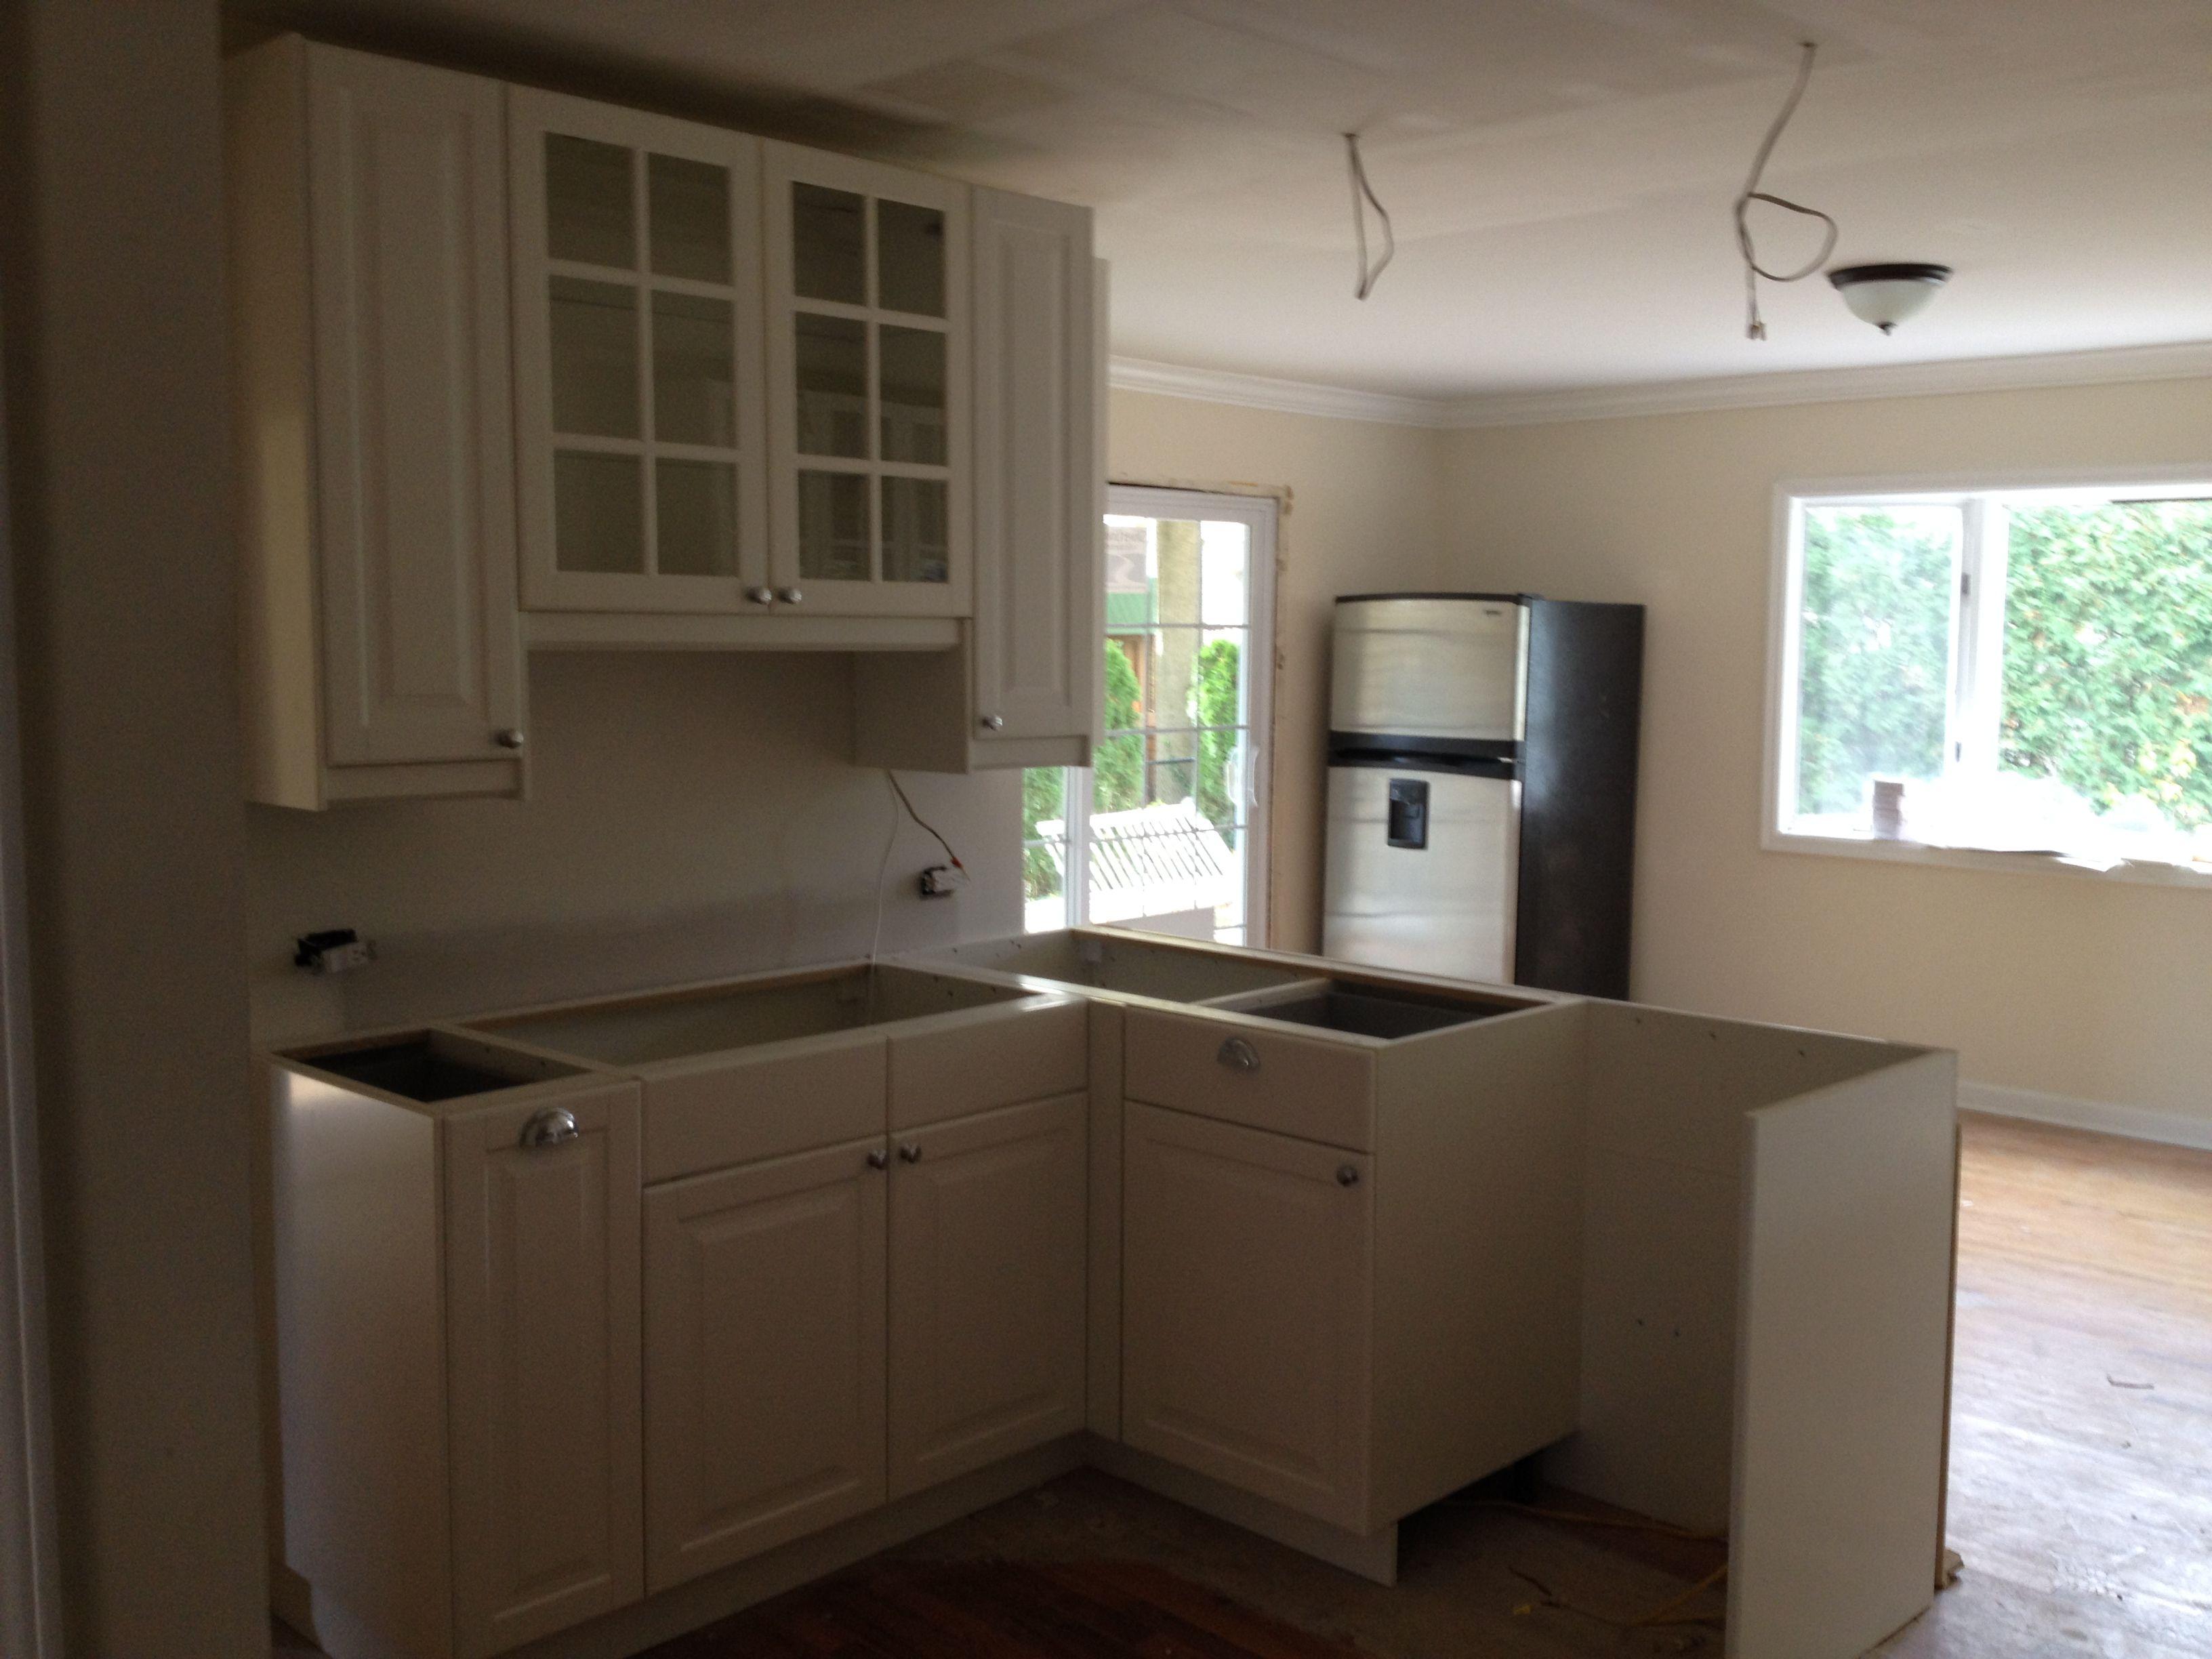 Glen Rock Nj Ikea Kitchen Cabinet Install Part 2 Kitchen Cabinets Kitchen Installing Cabinets